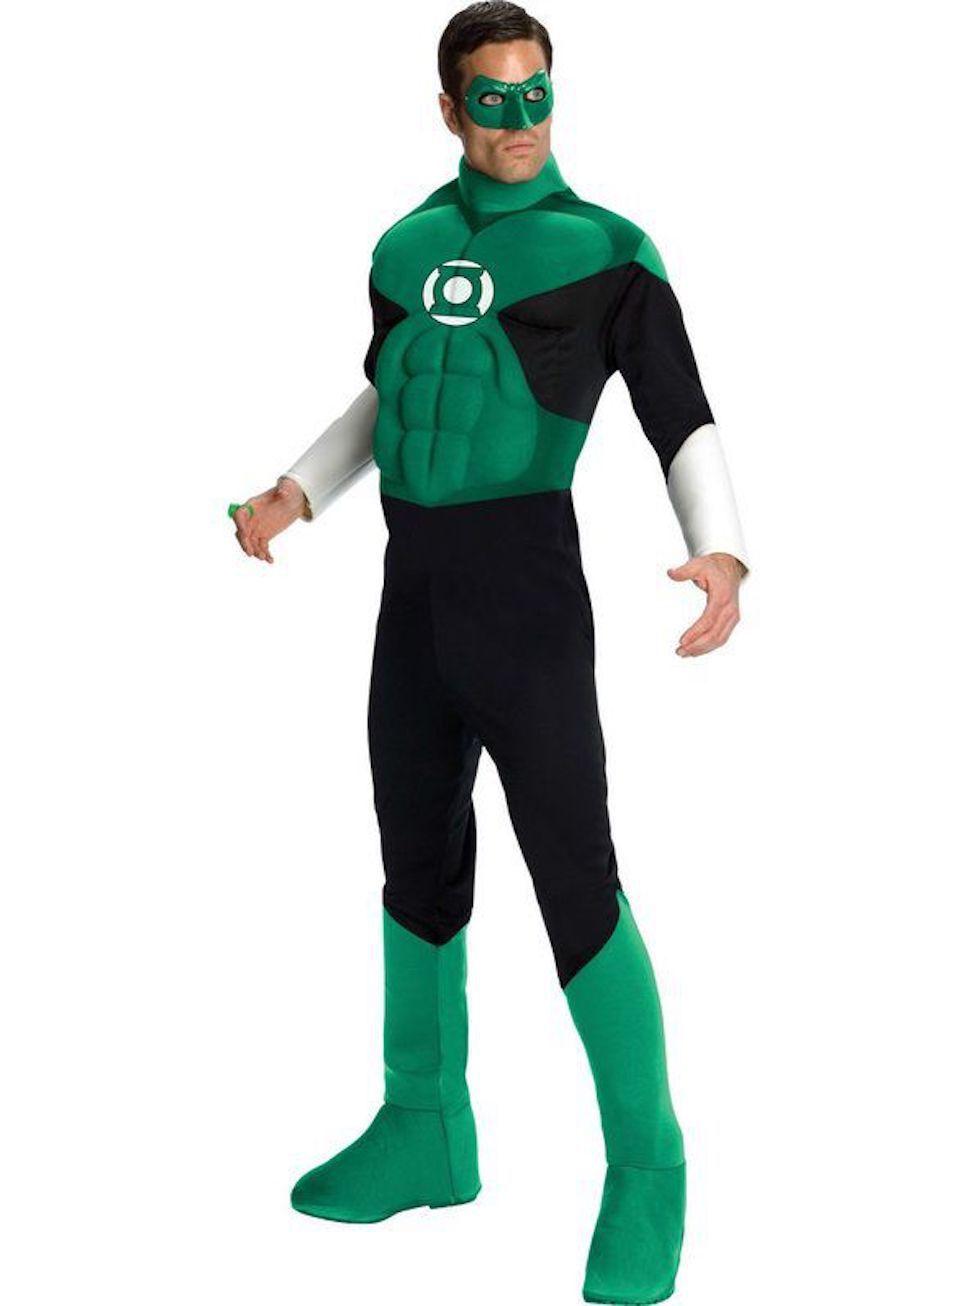 Costume SuperCenter  sc 1 st  Menu0027s Health & The 15 Best Adult Superhero Costumes To Wear This Halloween